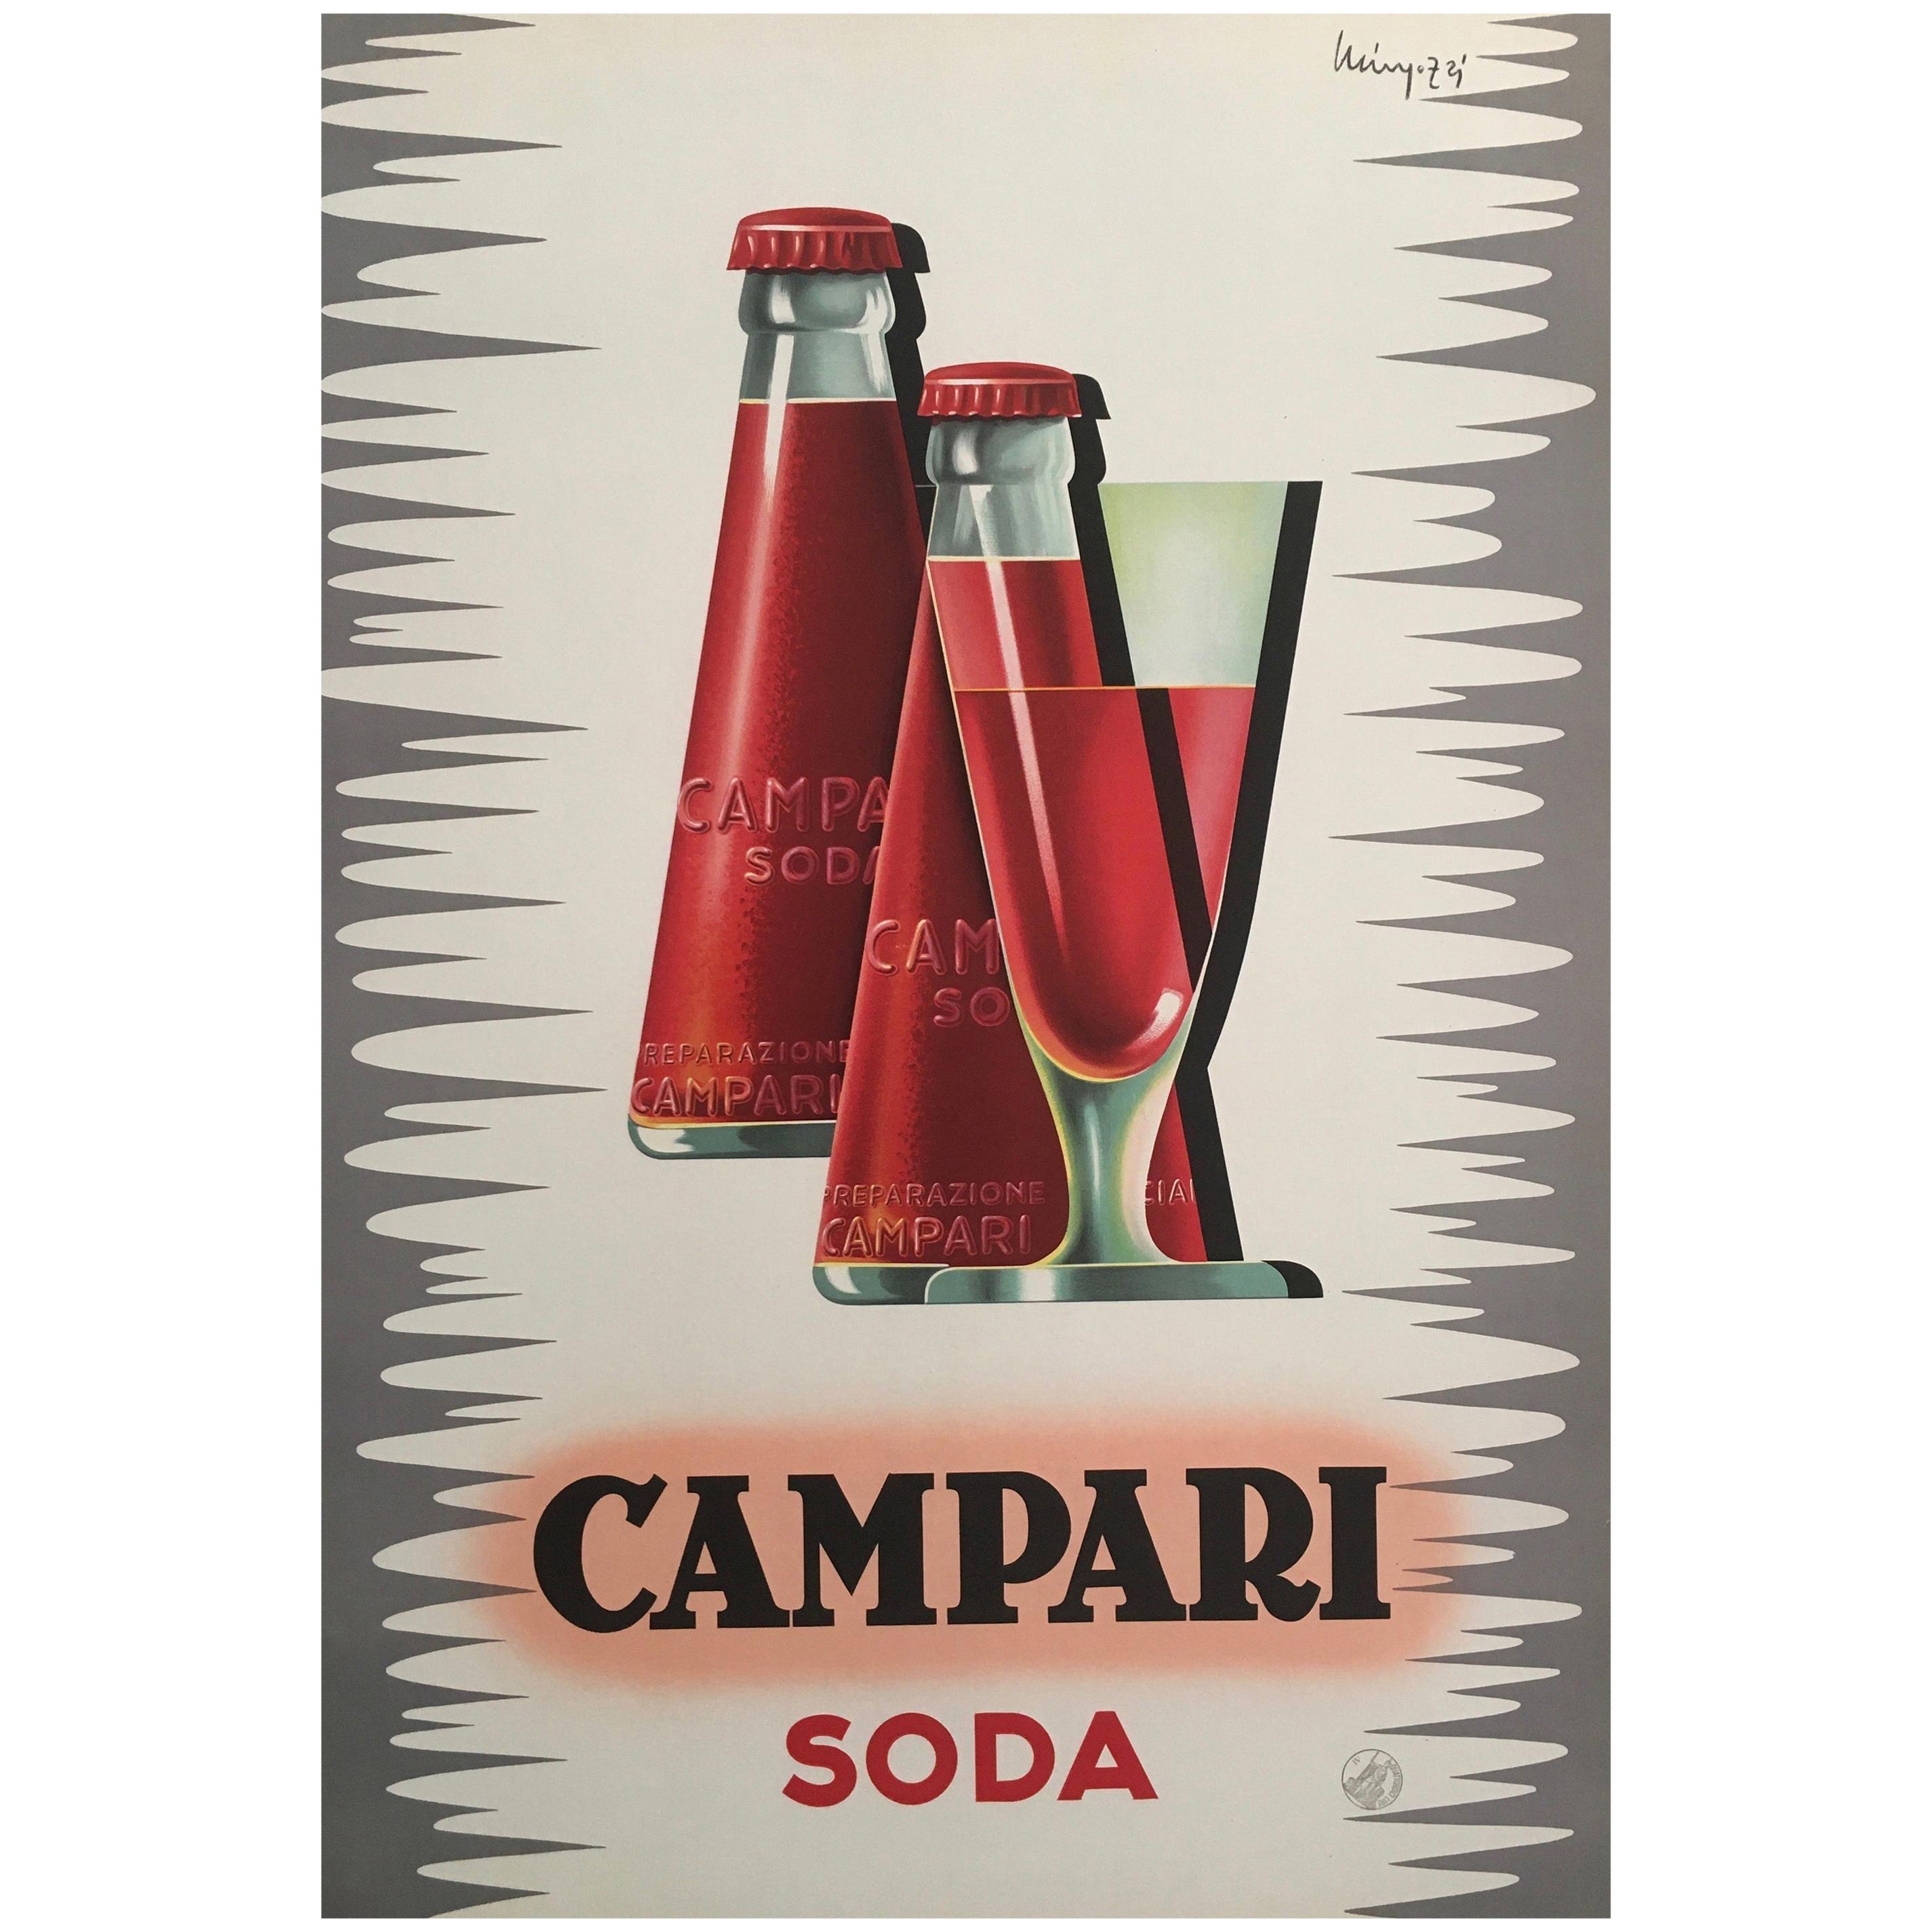 Original Vintage Midcentury French 'Campari Soda' Poster by Mingozzi, 1950